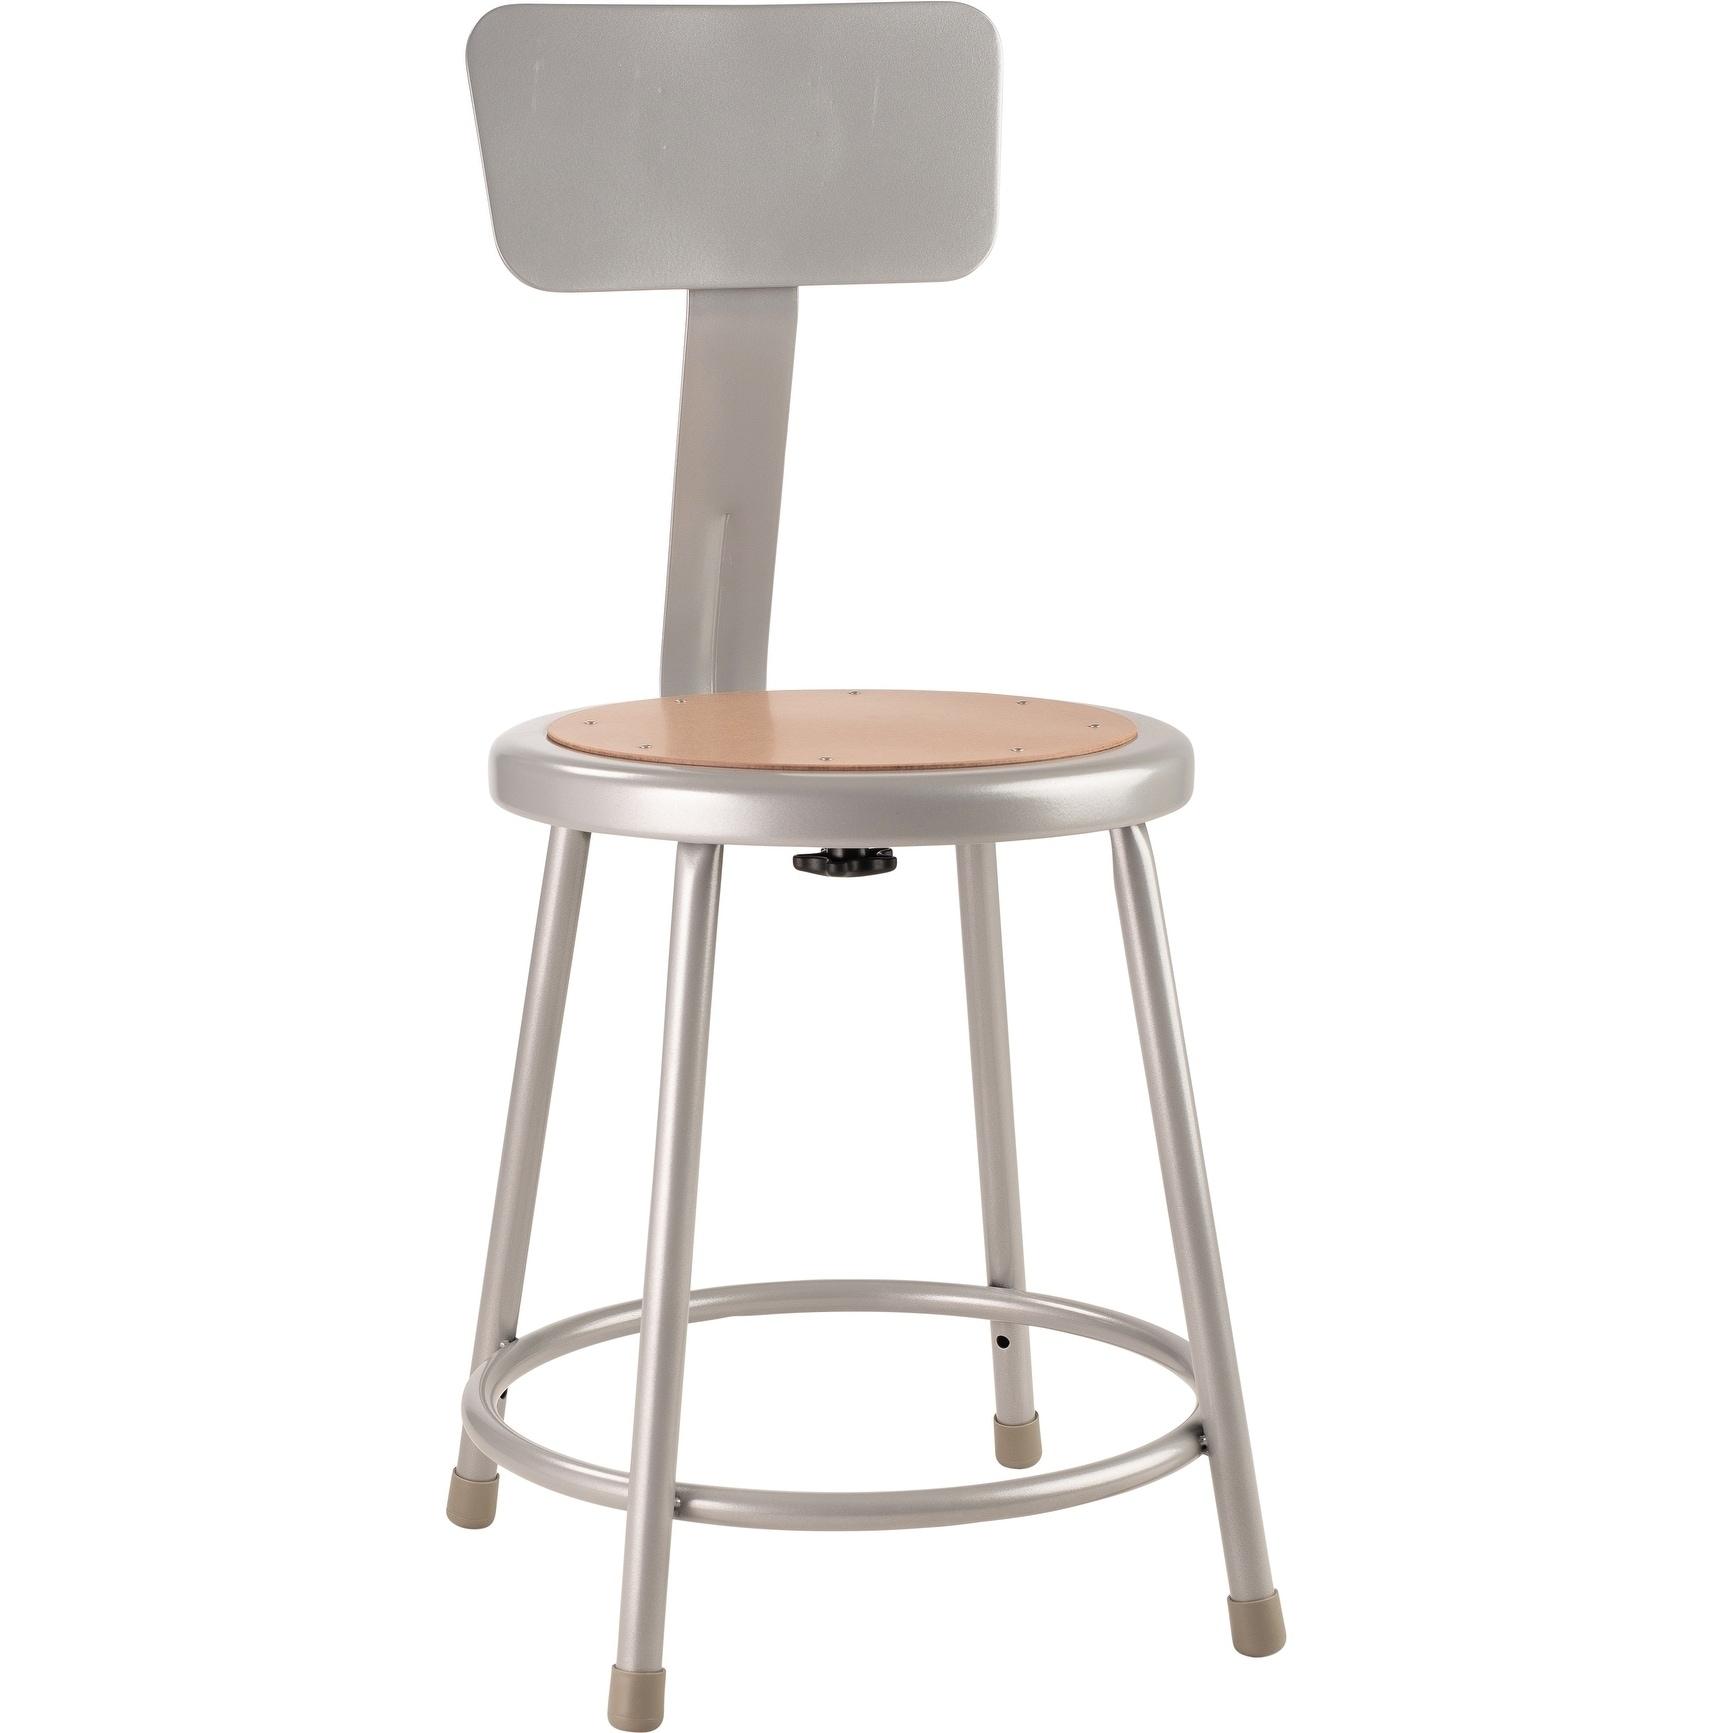 Amazing Nps 18 Heavy Duty Steel Stool With Backrest Grey Ibusinesslaw Wood Chair Design Ideas Ibusinesslaworg